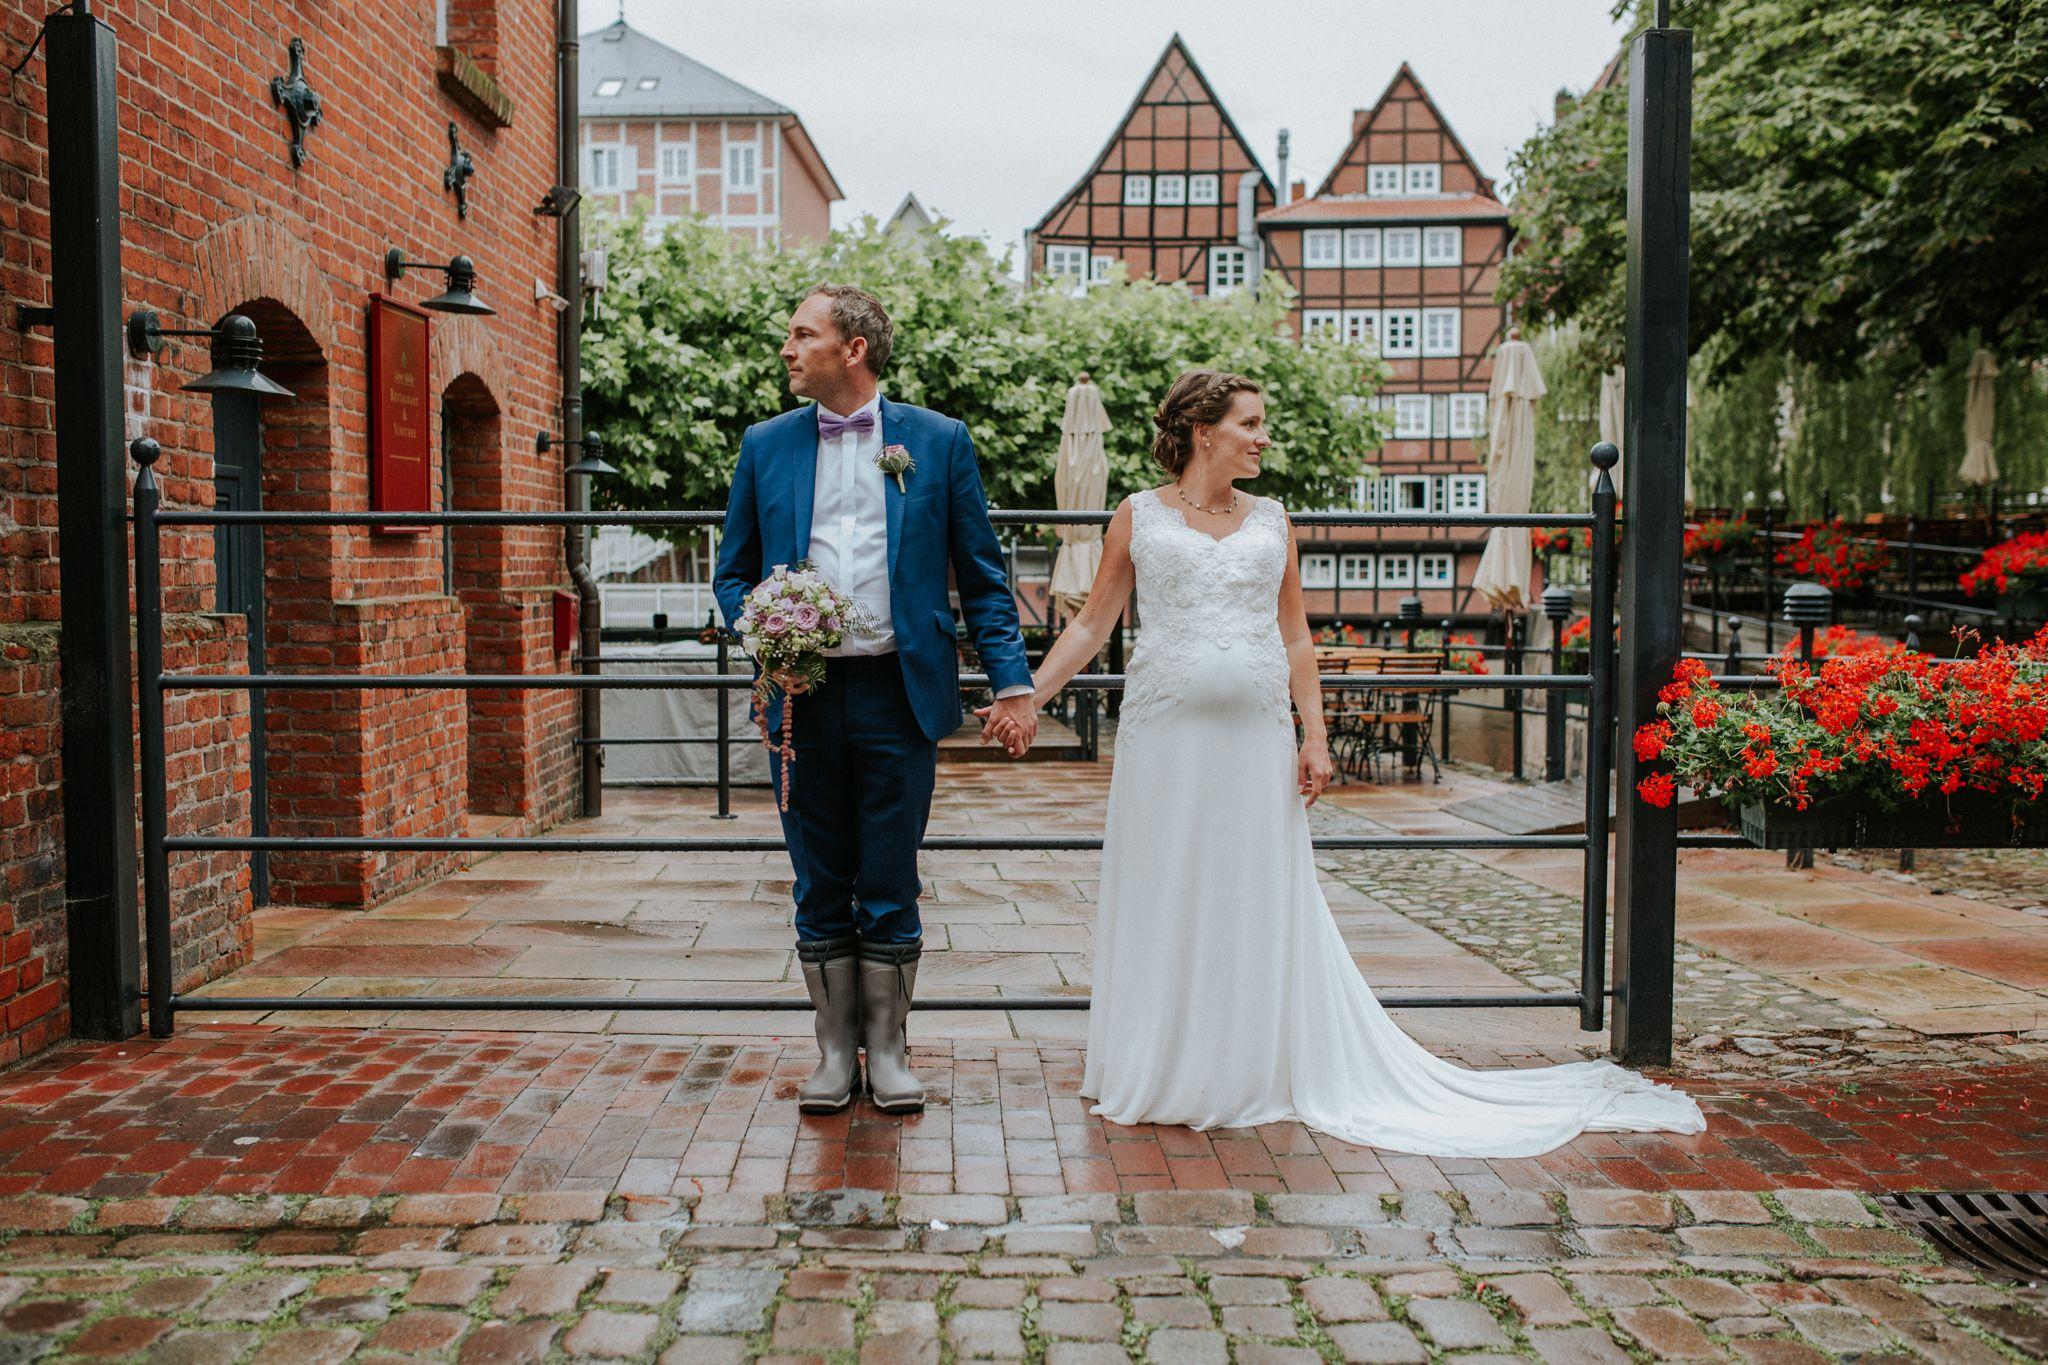 Lneburg  Wedding photography by Sana Lis wwwsanalisde